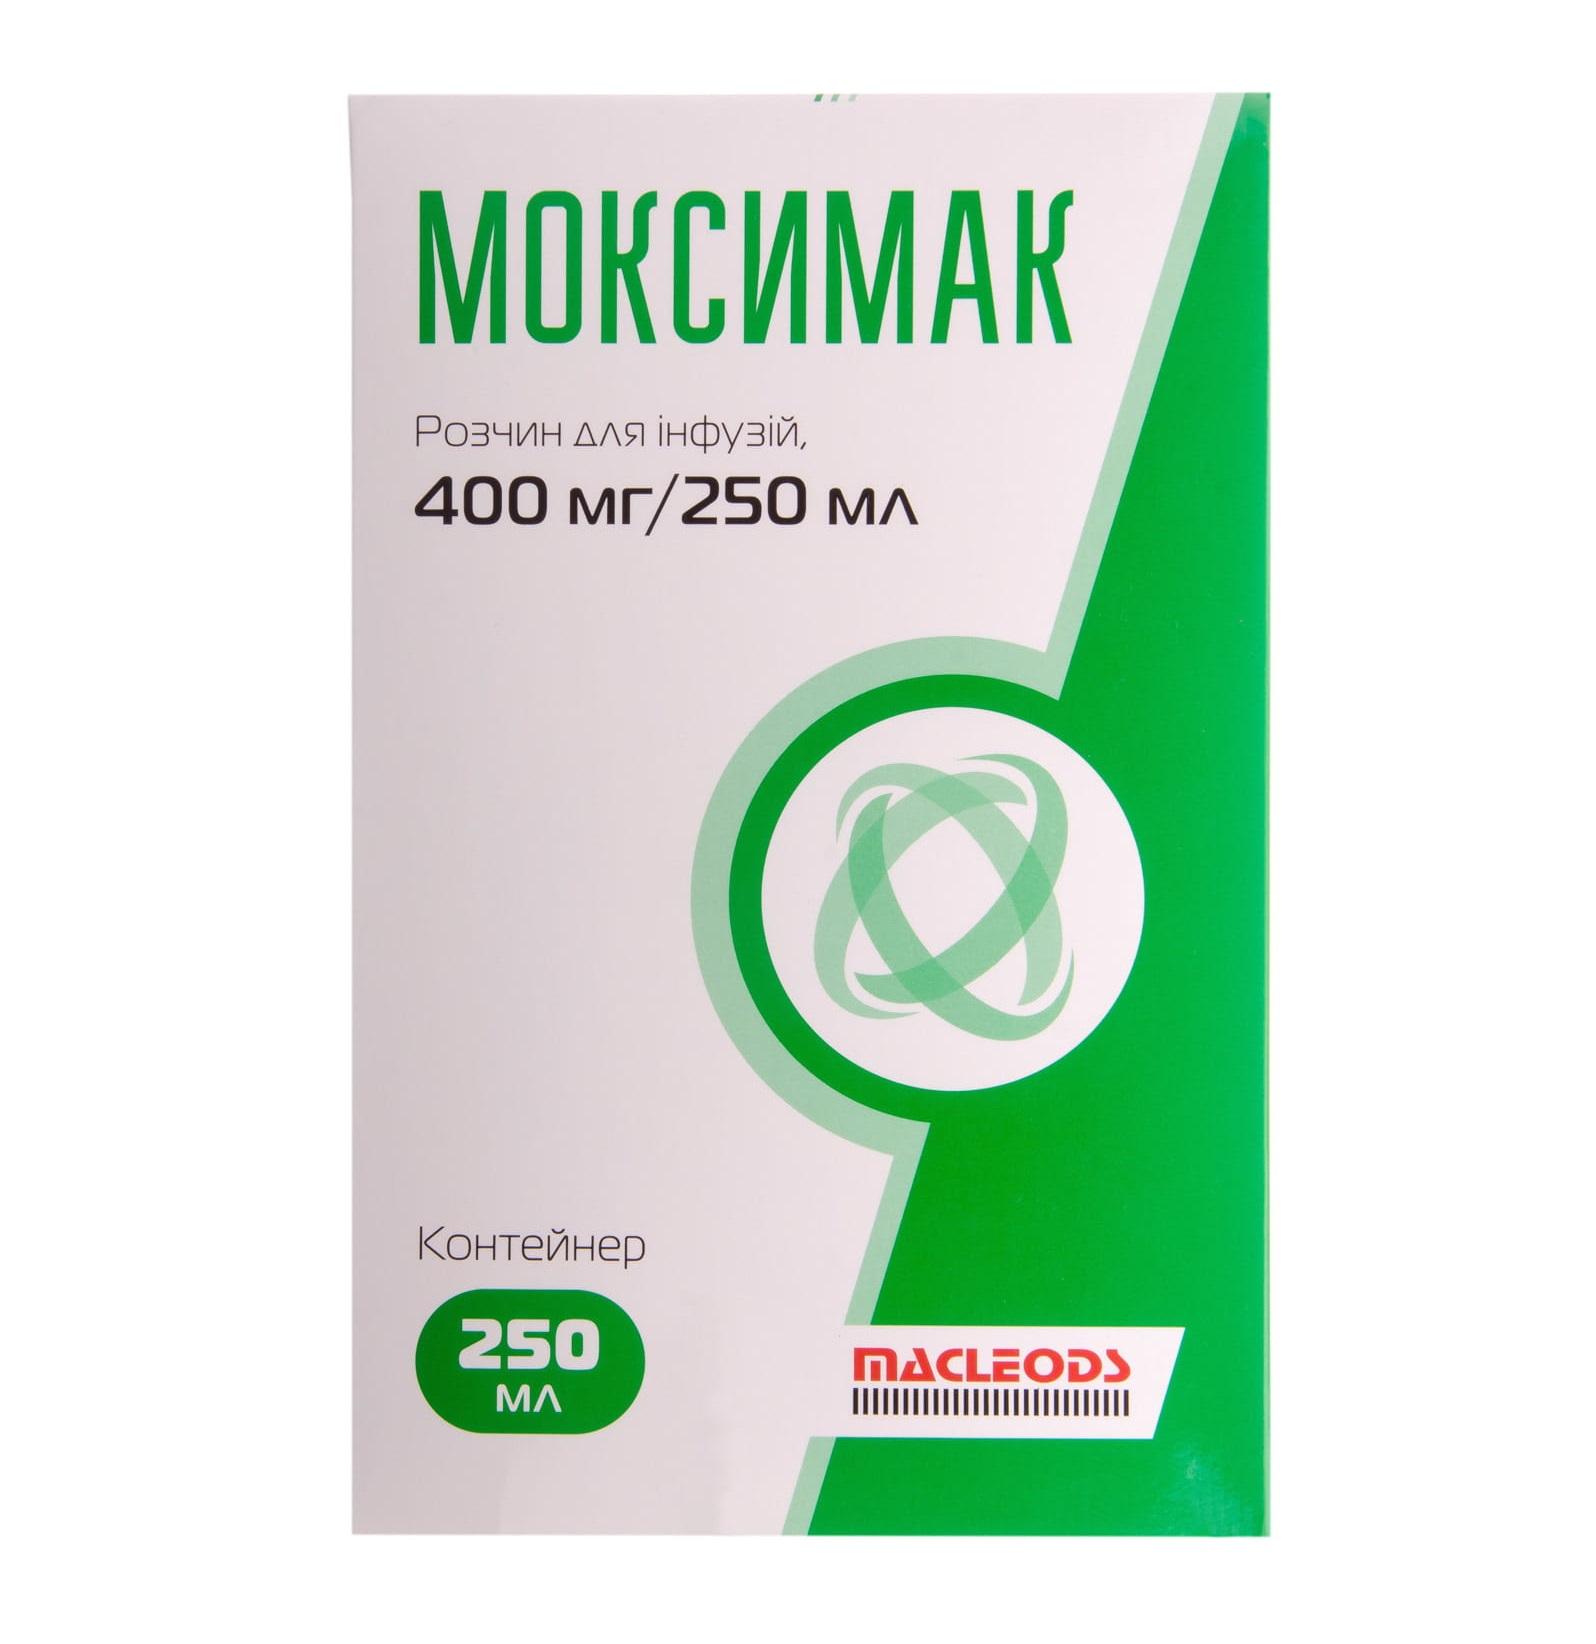 МОКСИМАК Р-Р Д/ИНФ. 400МГ/250МЛ 250МЛ